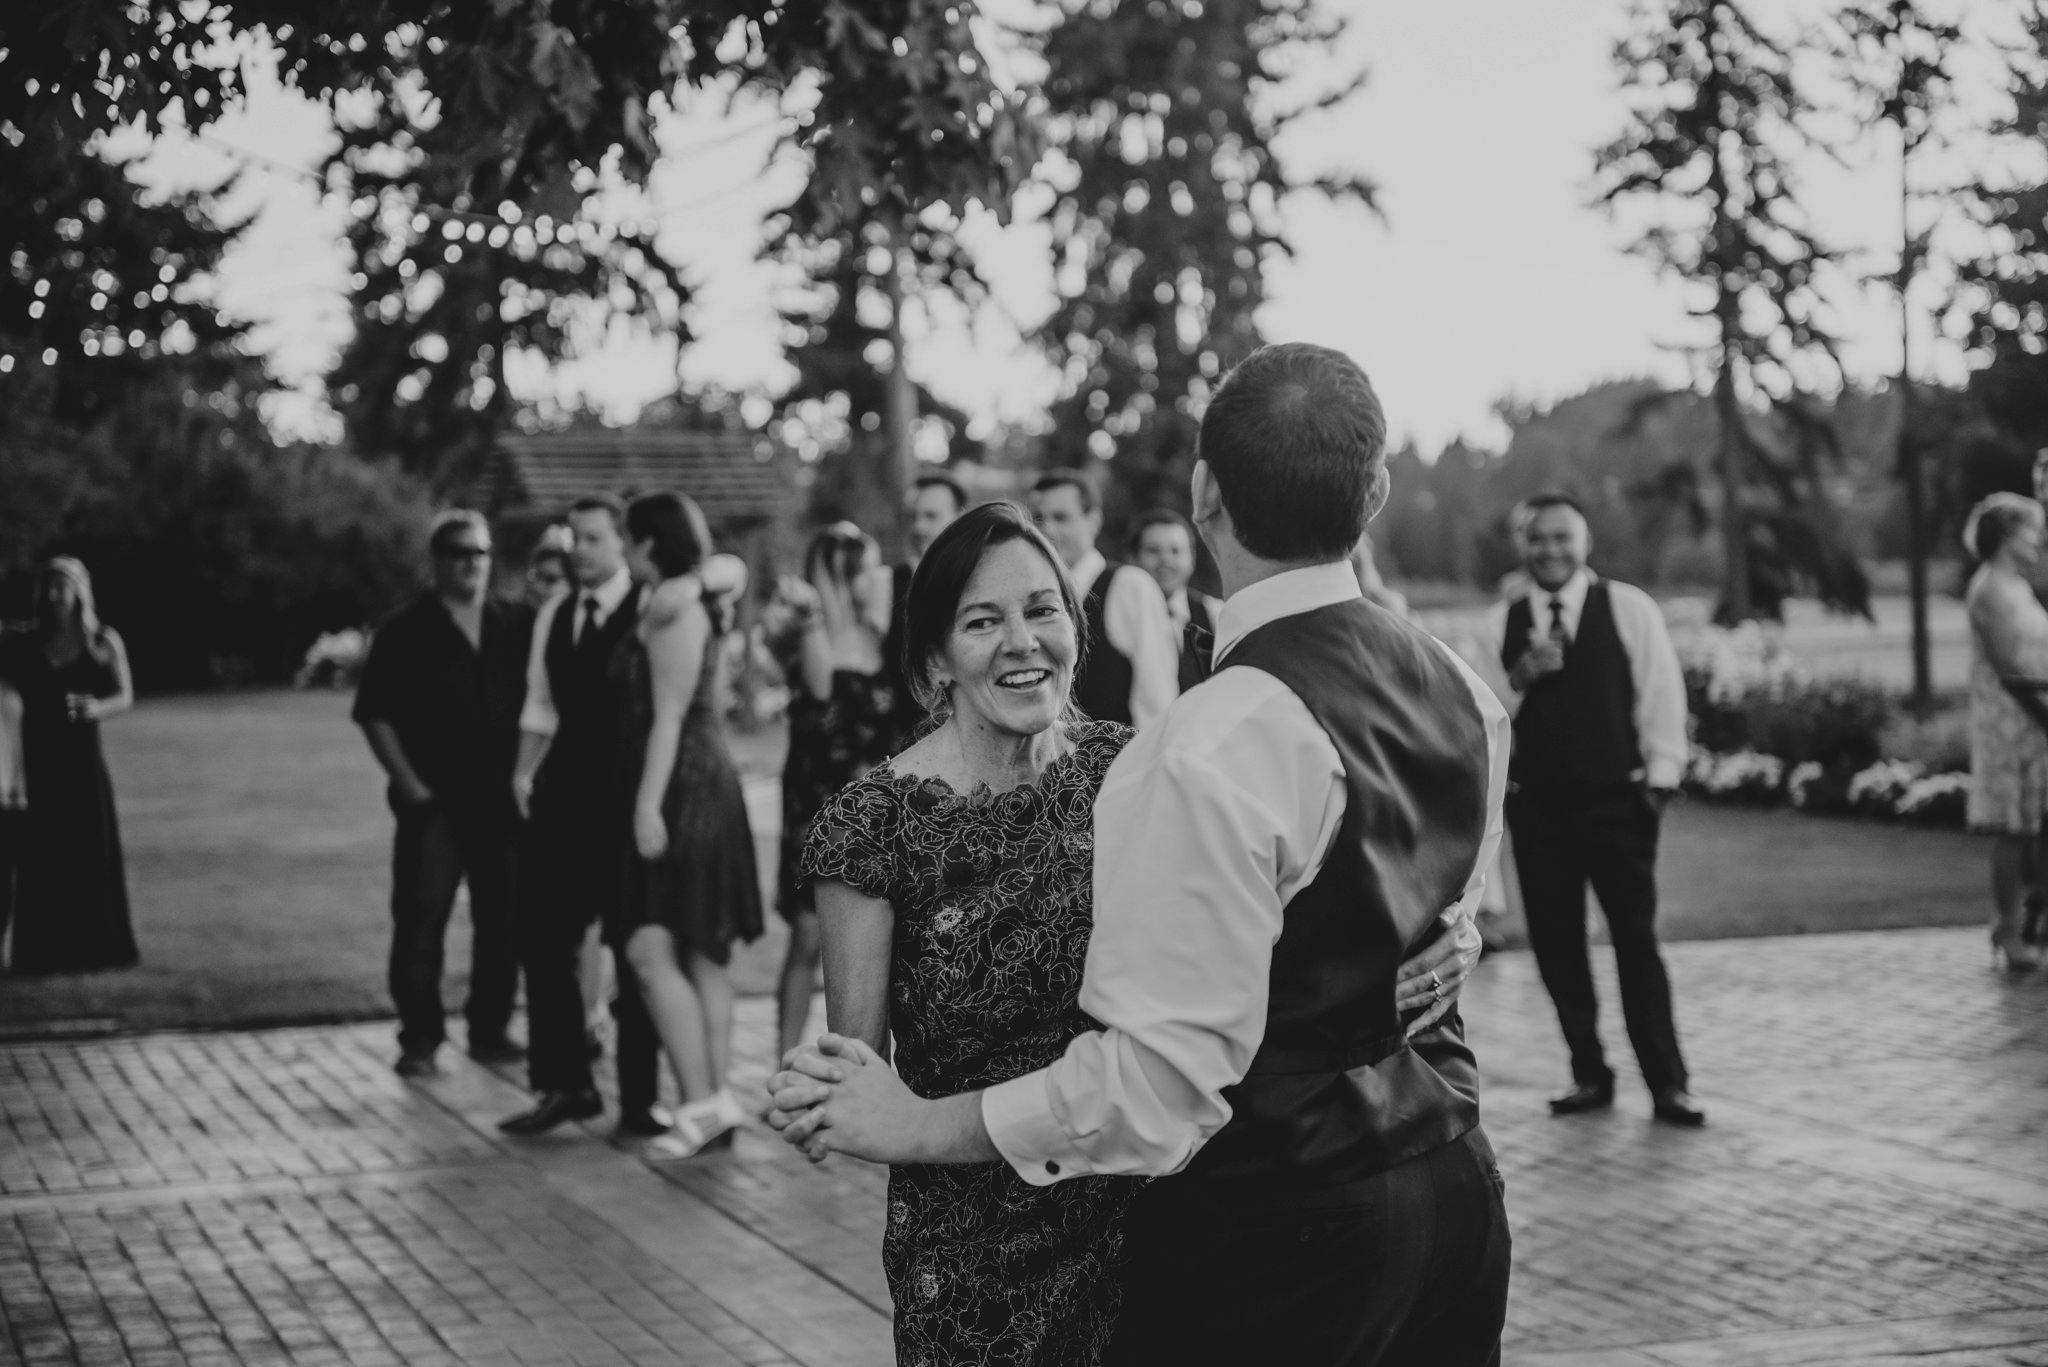 kristen-and-cody-the-kelley-farm-wedding-seattle-photographer-caitlyn-nikula-107.jpg